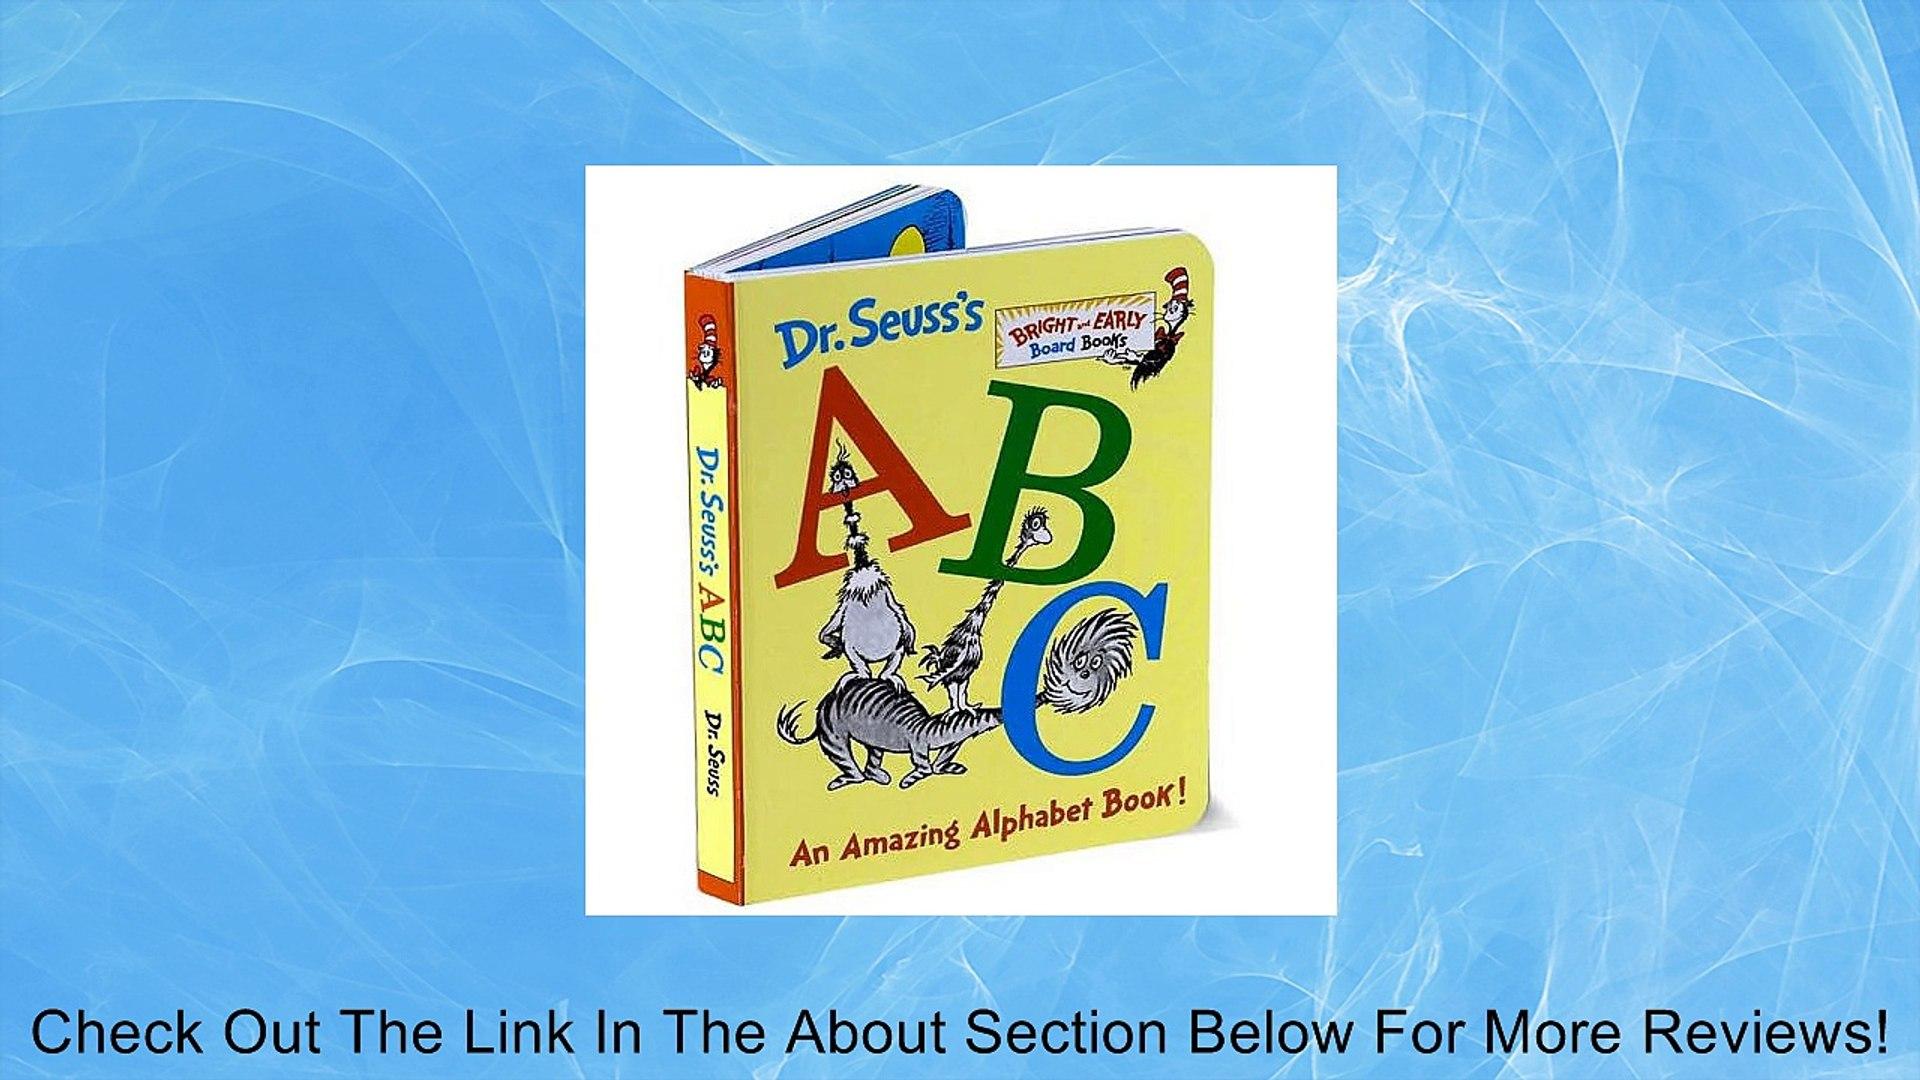 Dr. Seuss's Abc An Amazing Alphabet Board Book Review   video ...